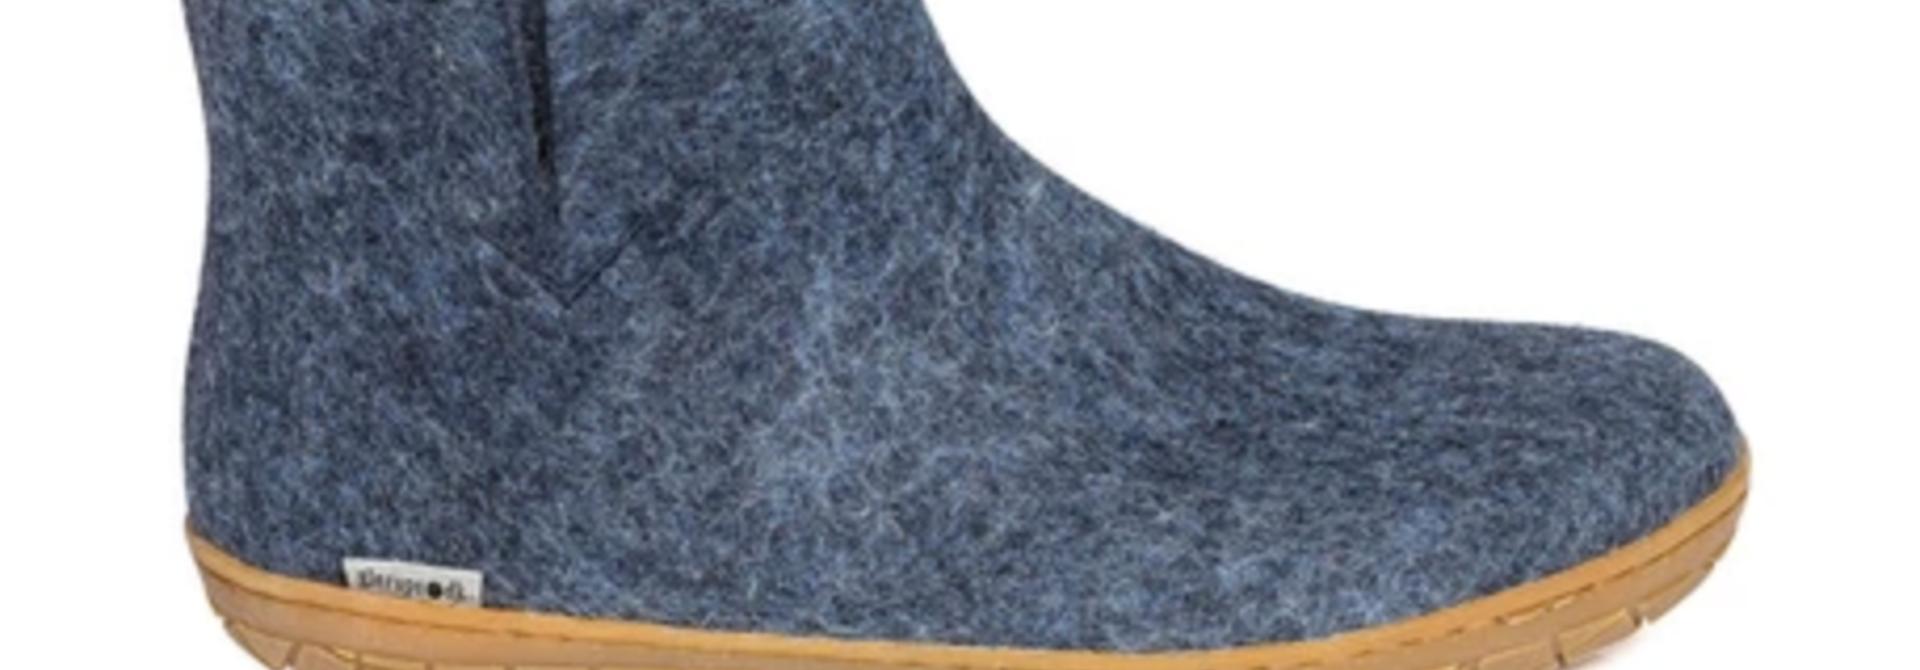 Glerups Boot Rubber Sole